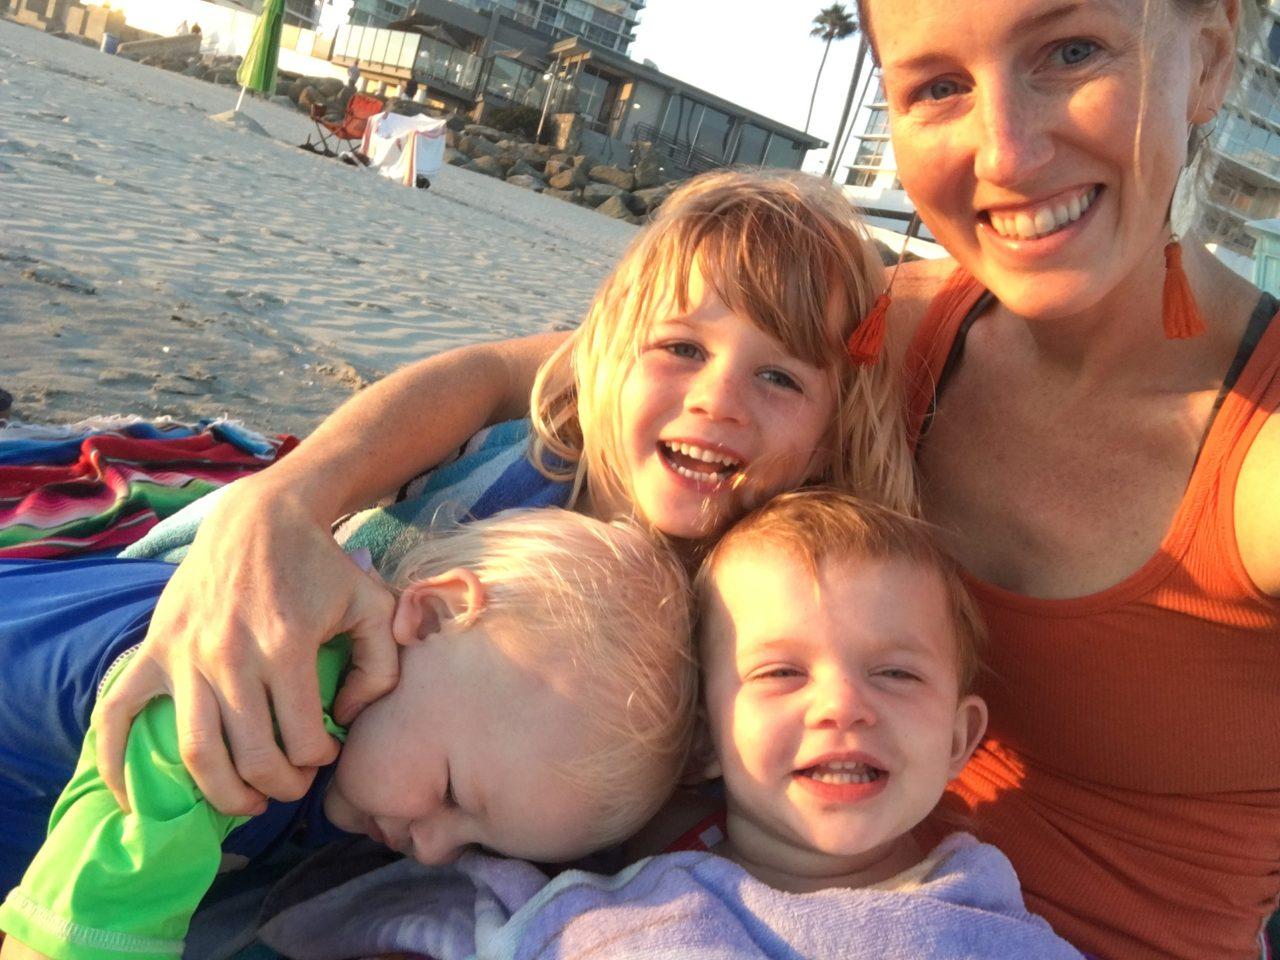 Alicia-moms-kids-beach-scaled-1-1280x960.jpg